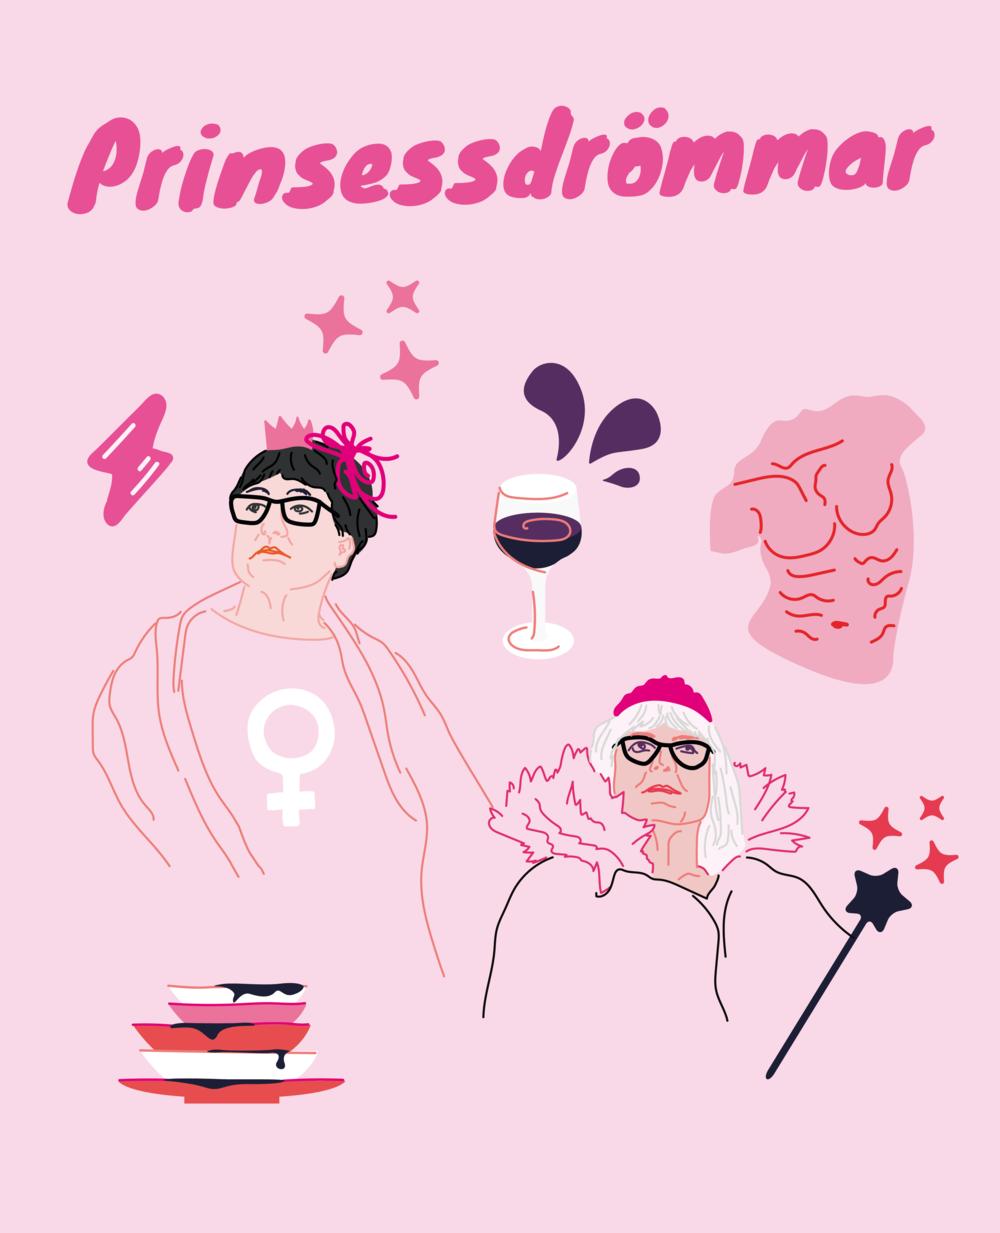 prinsessdrommar_Rityta 1.png